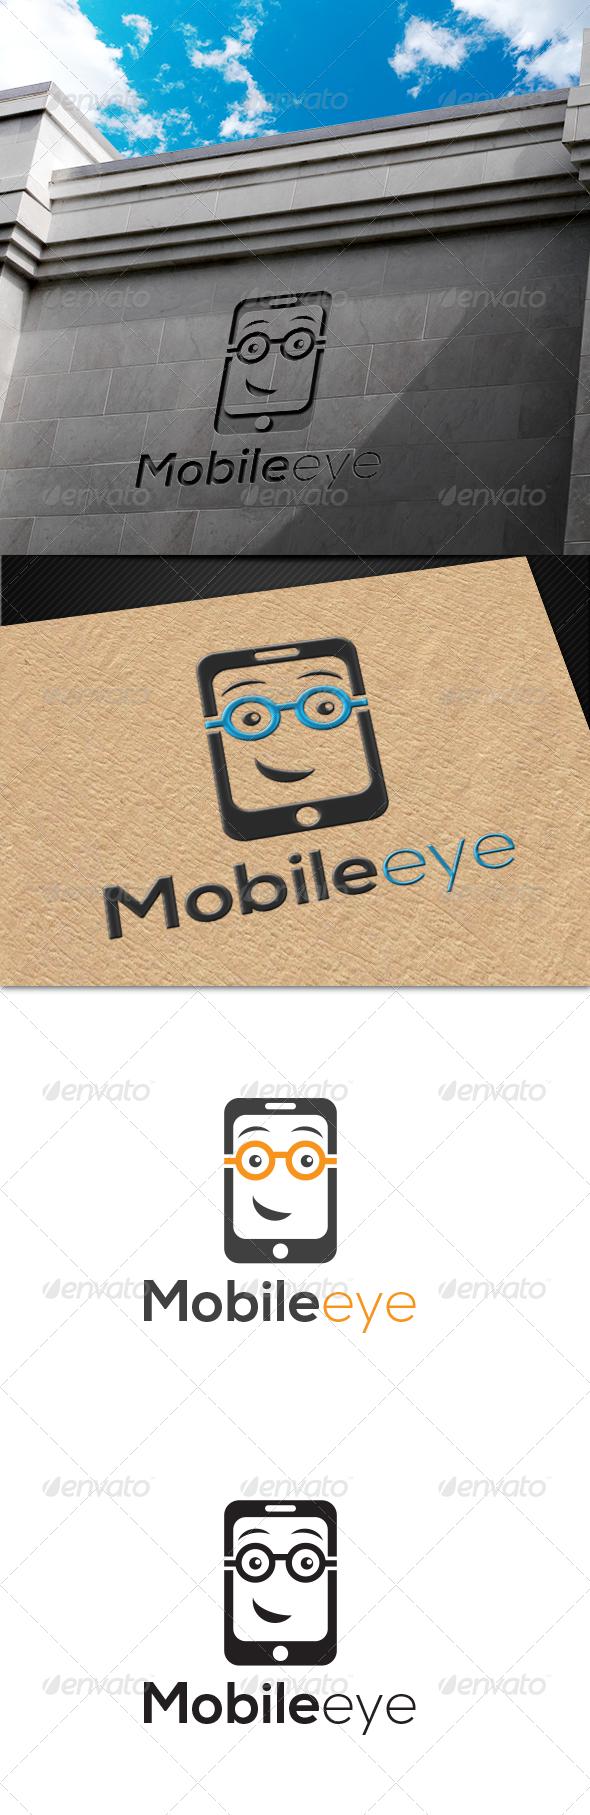 MobileEye Logo